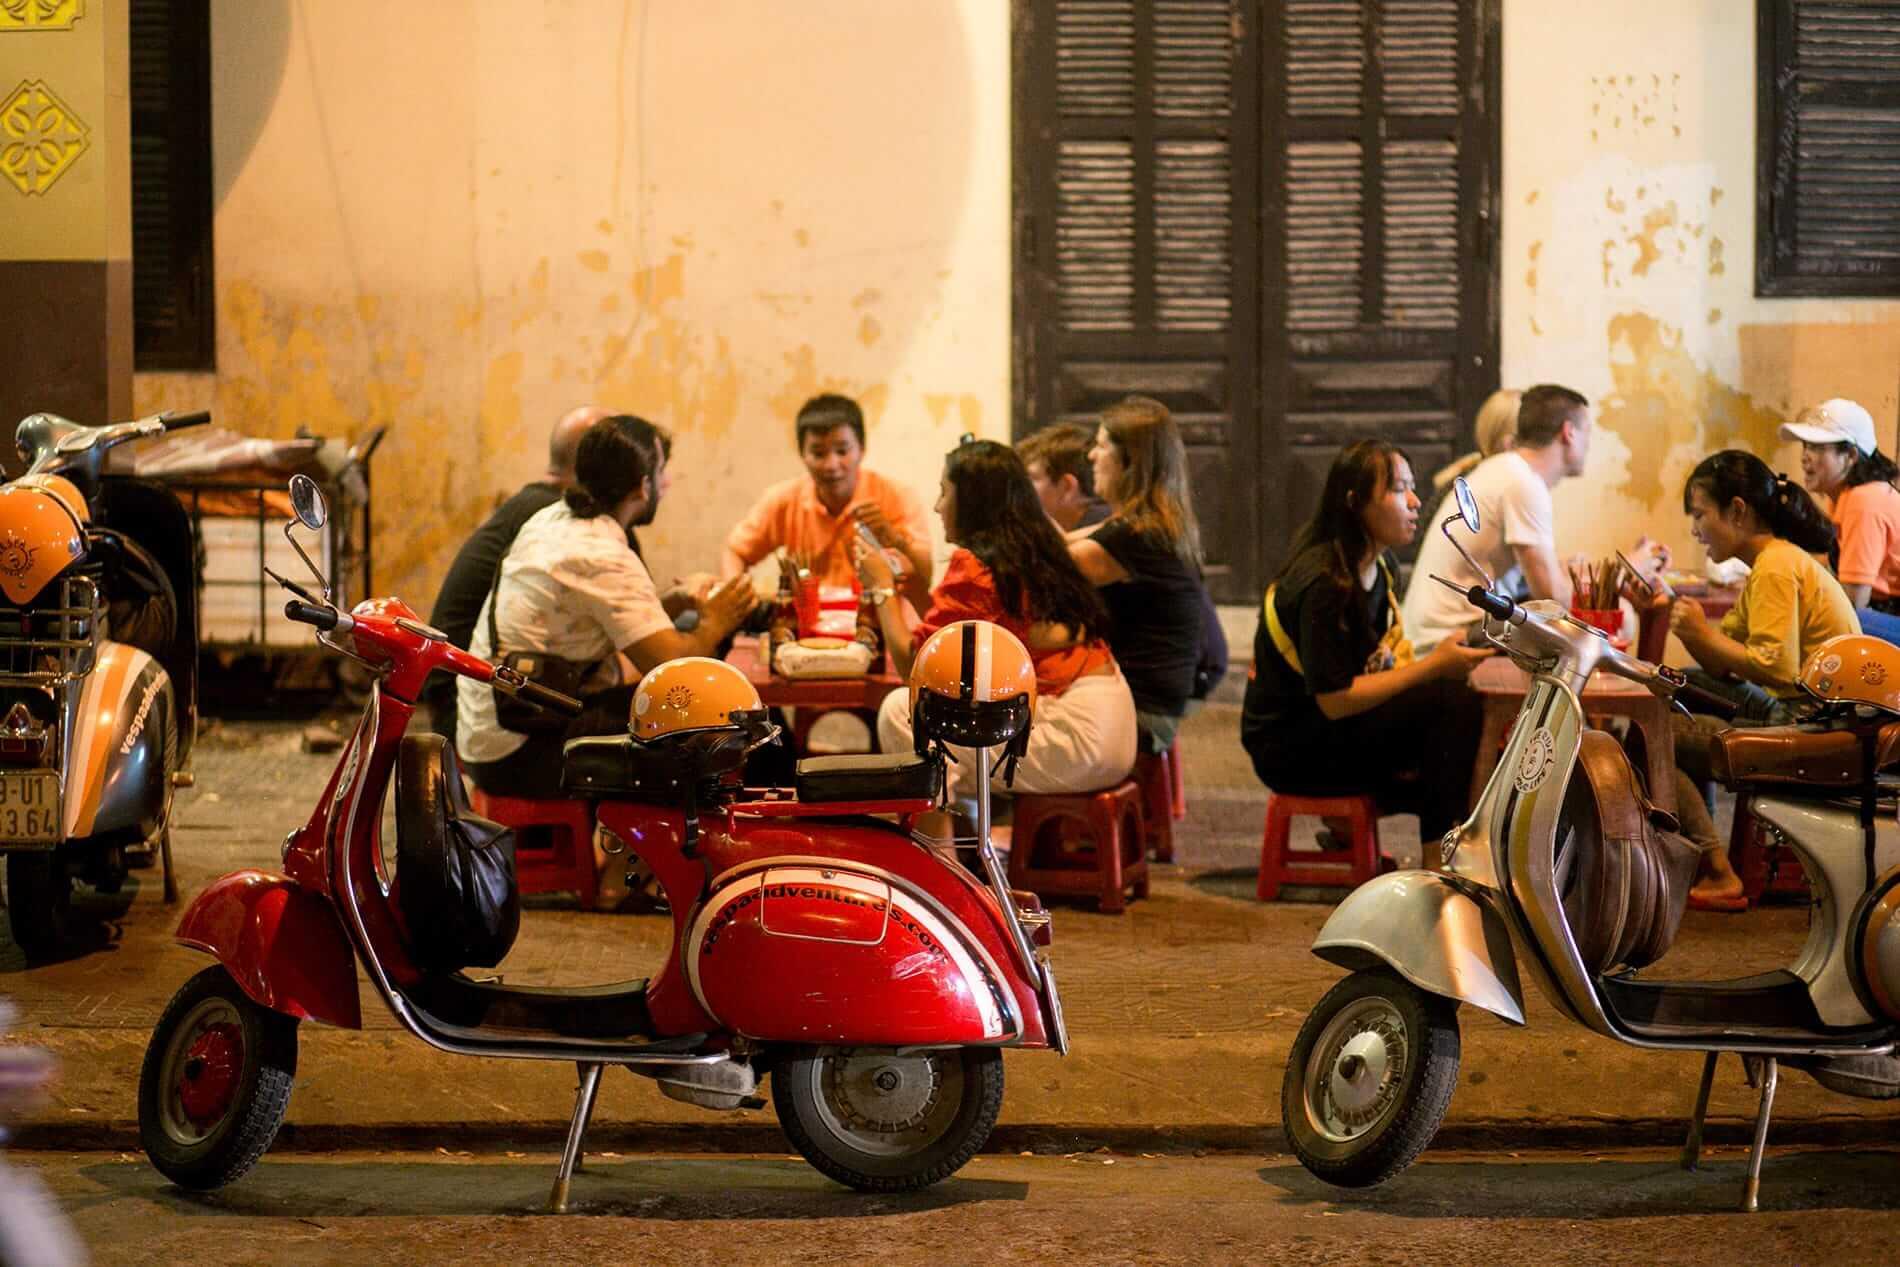 Vespa scooters on display